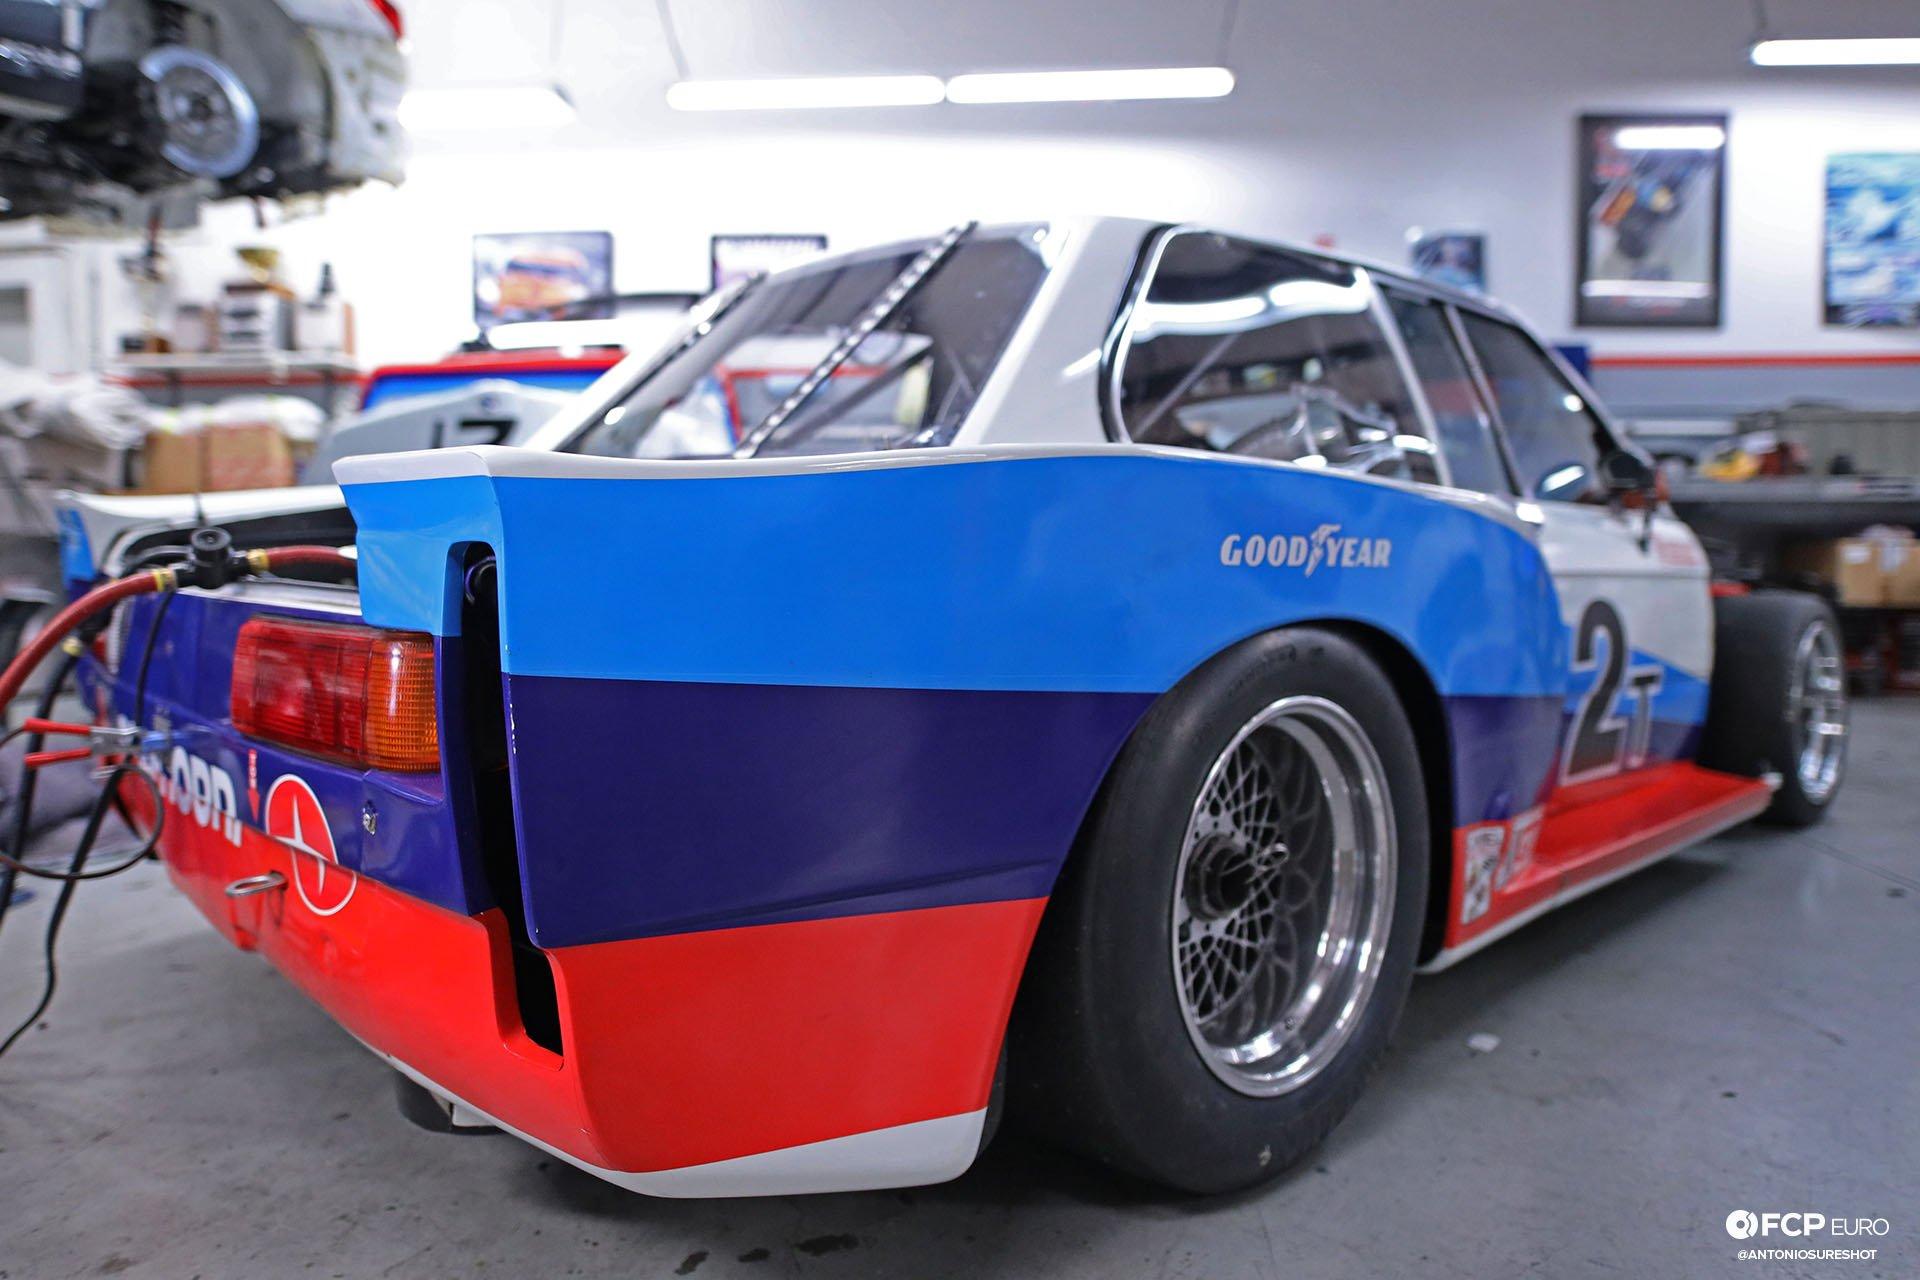 BMW E21 320 M12 Turbo IMSA Group 5 McLaren M12 BMWSF Henry Schmitt